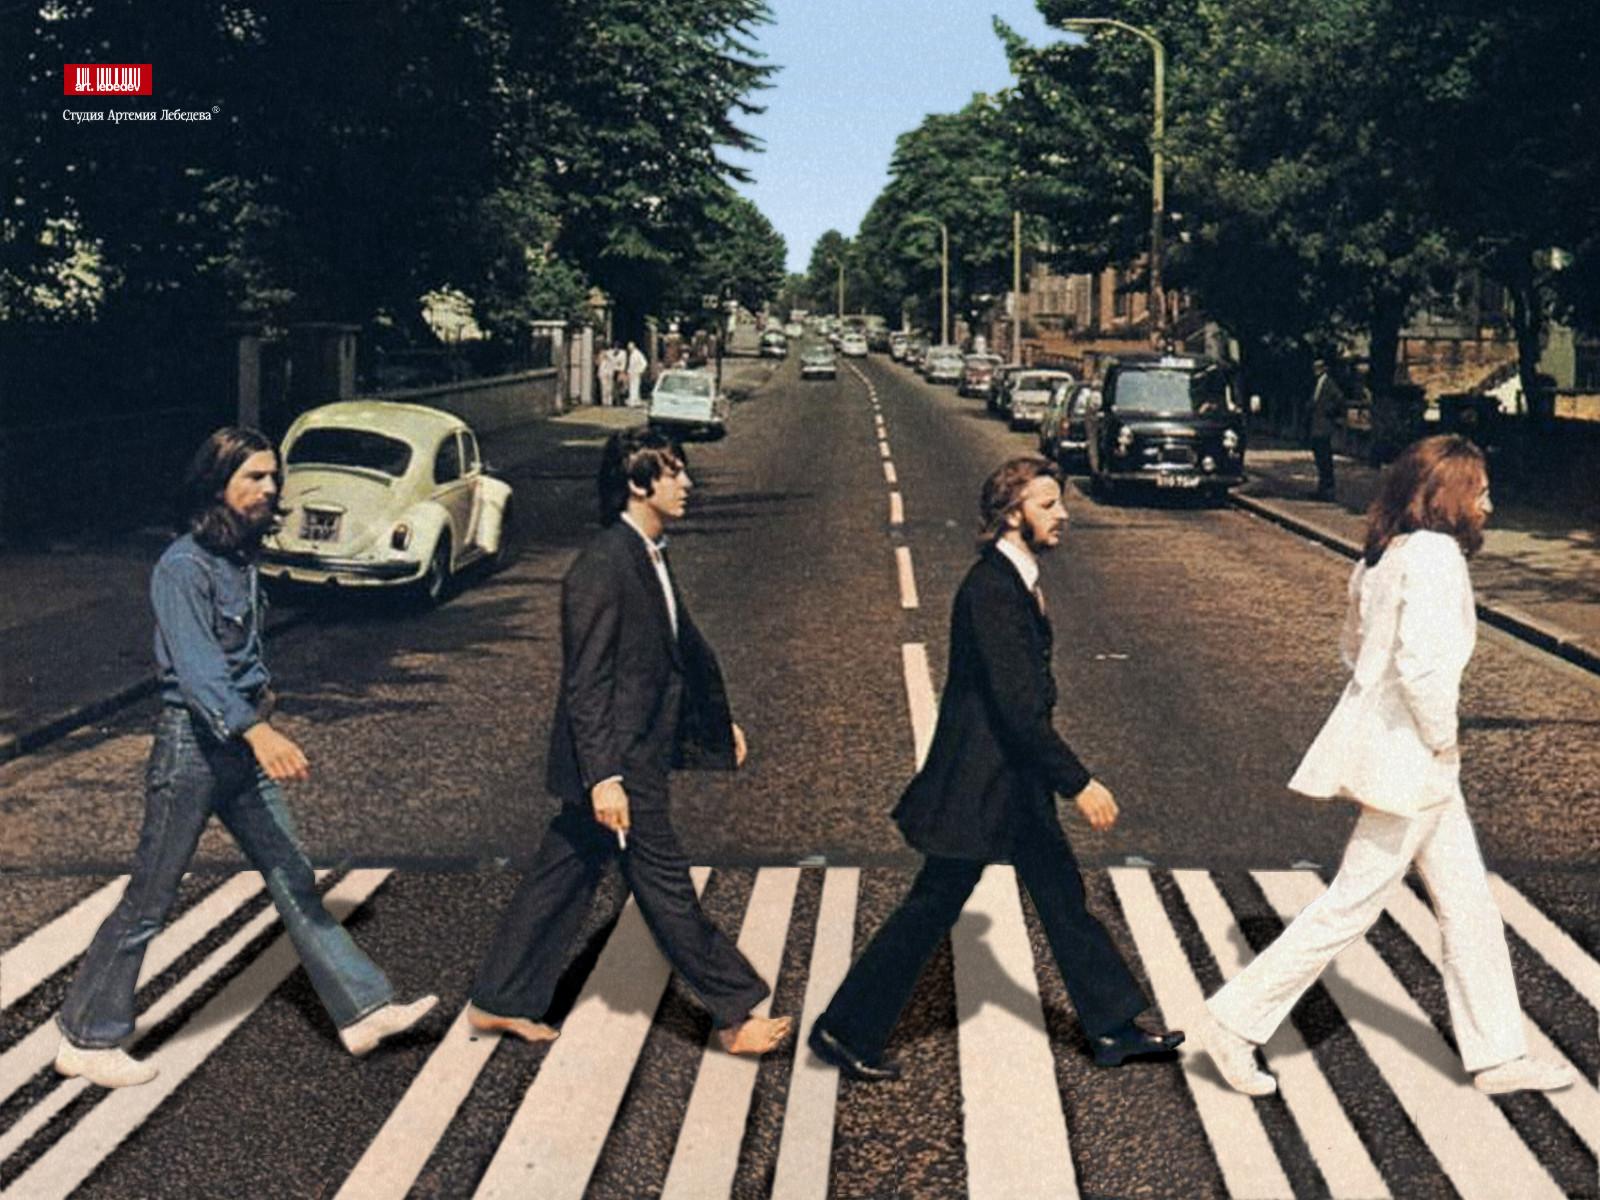 披頭四 the Beatles